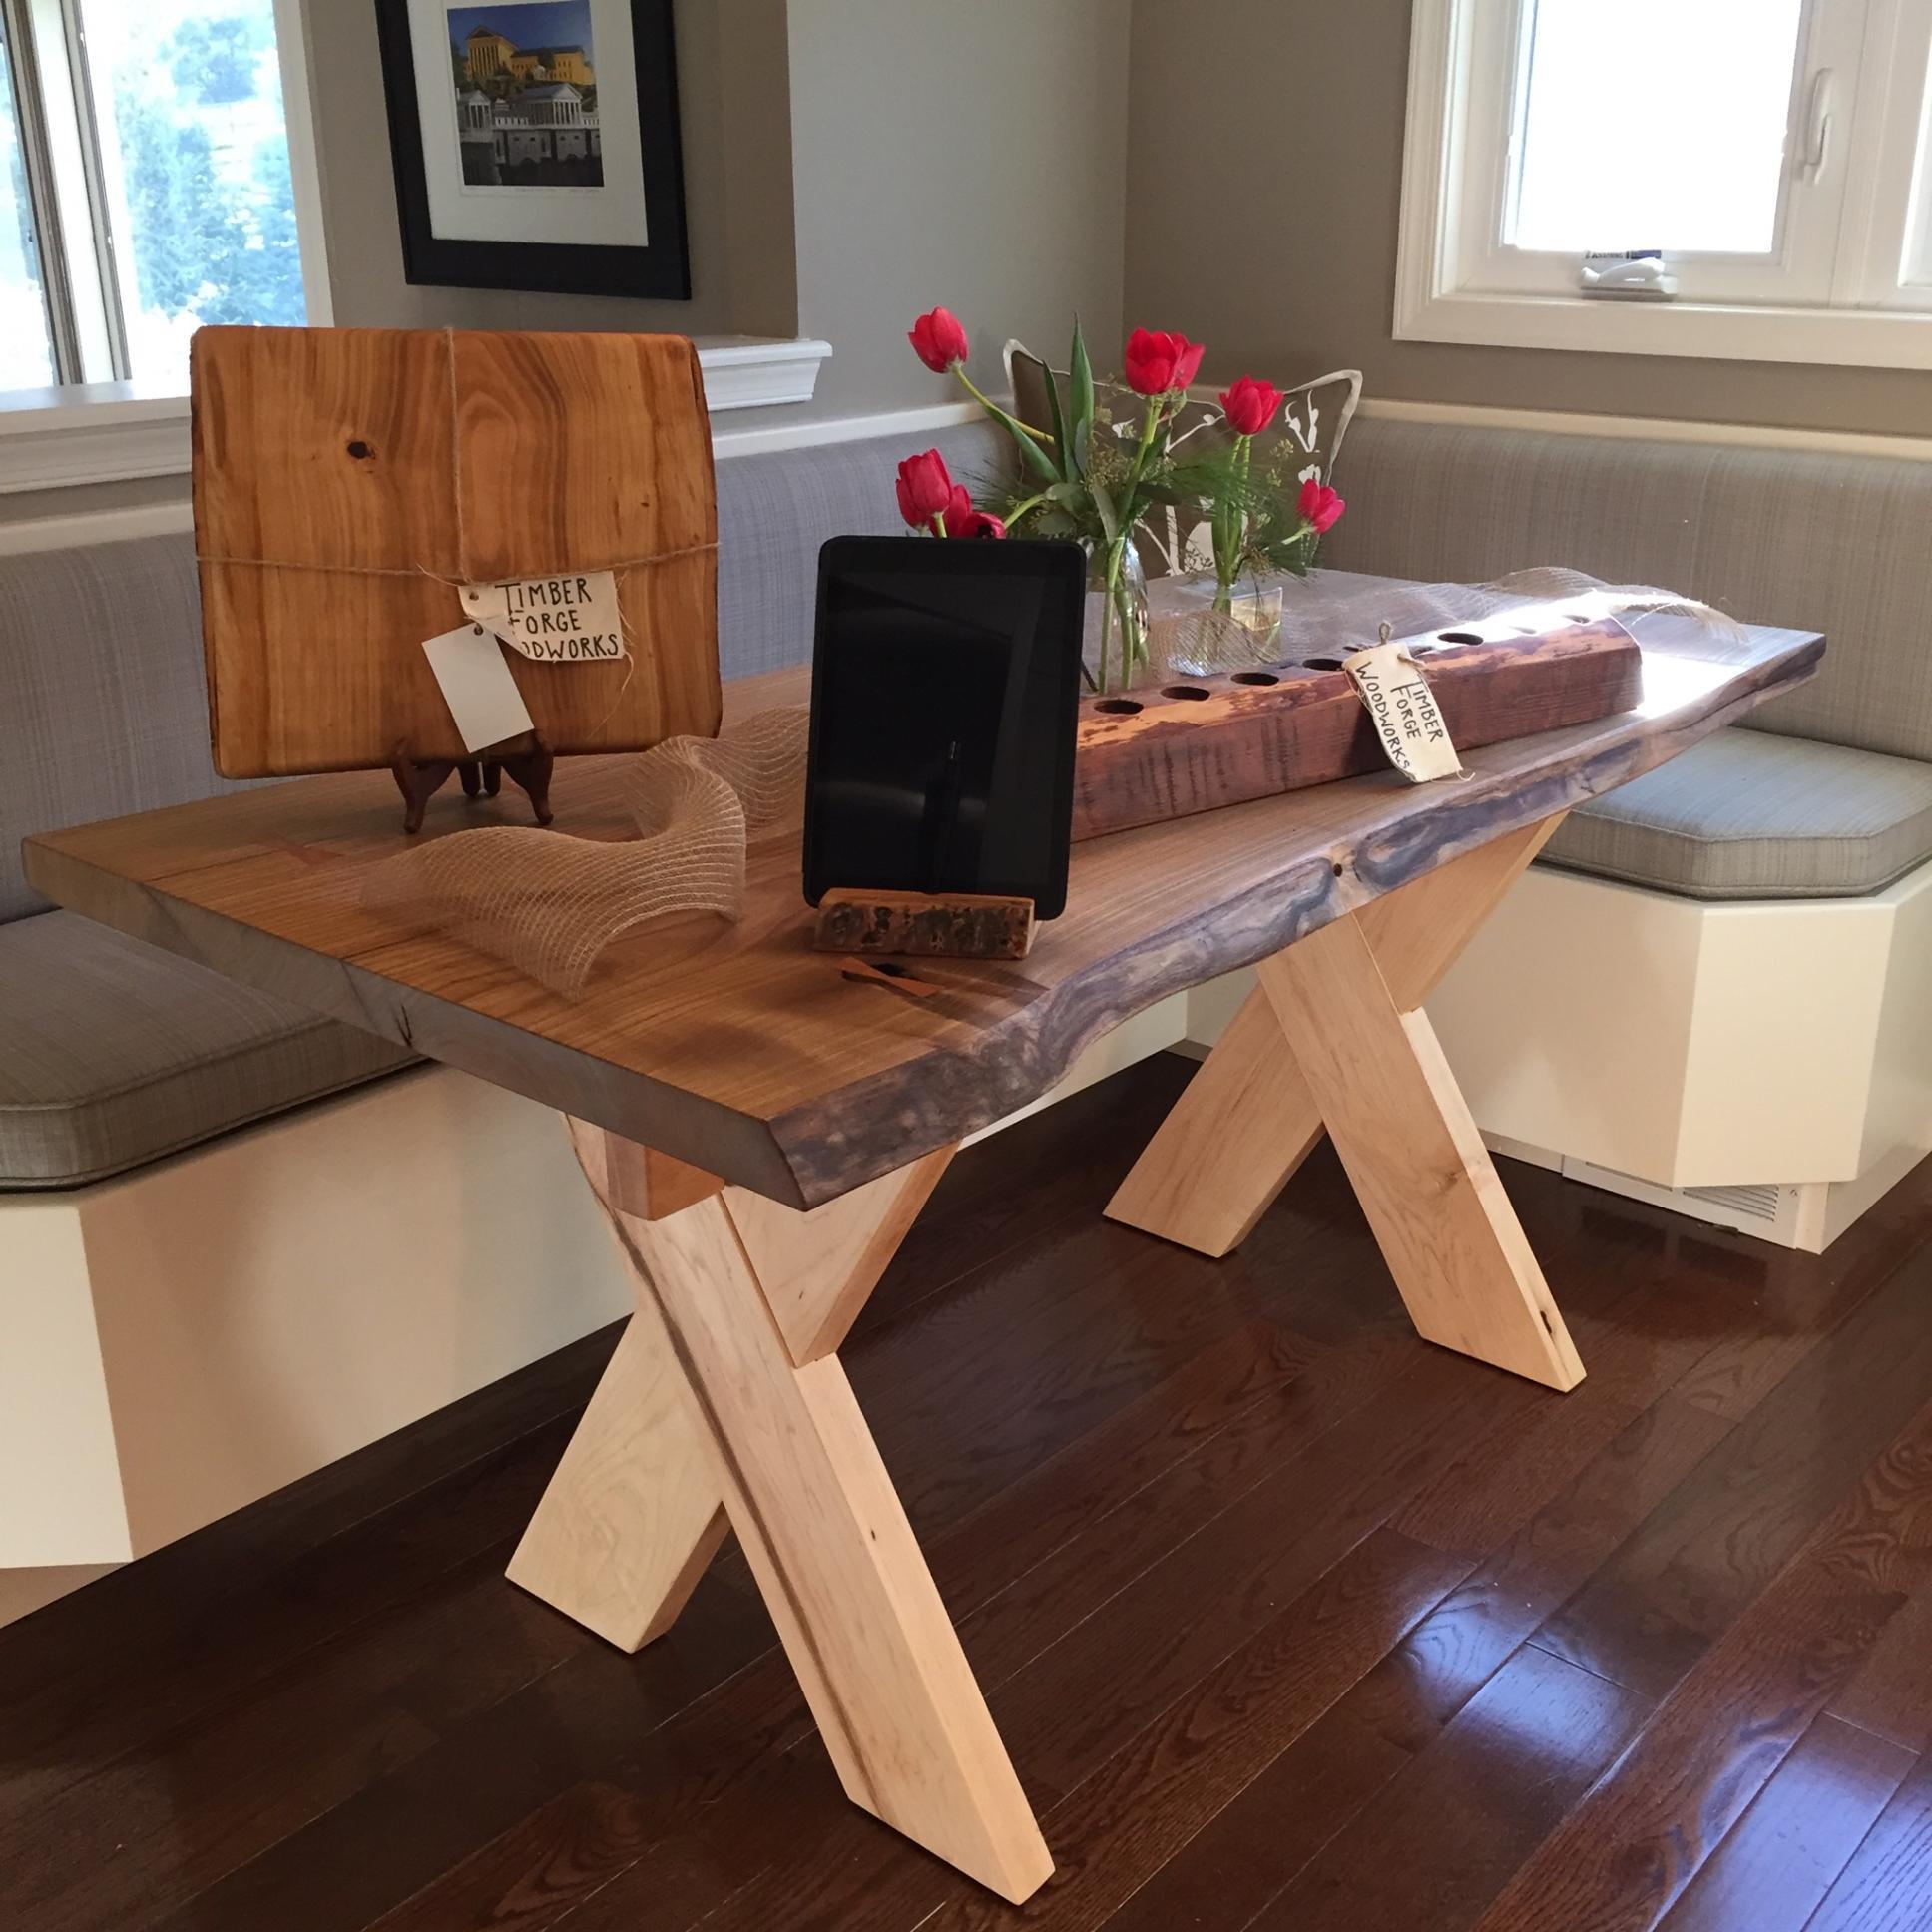 Cucumber Magnolia live-edge dining table